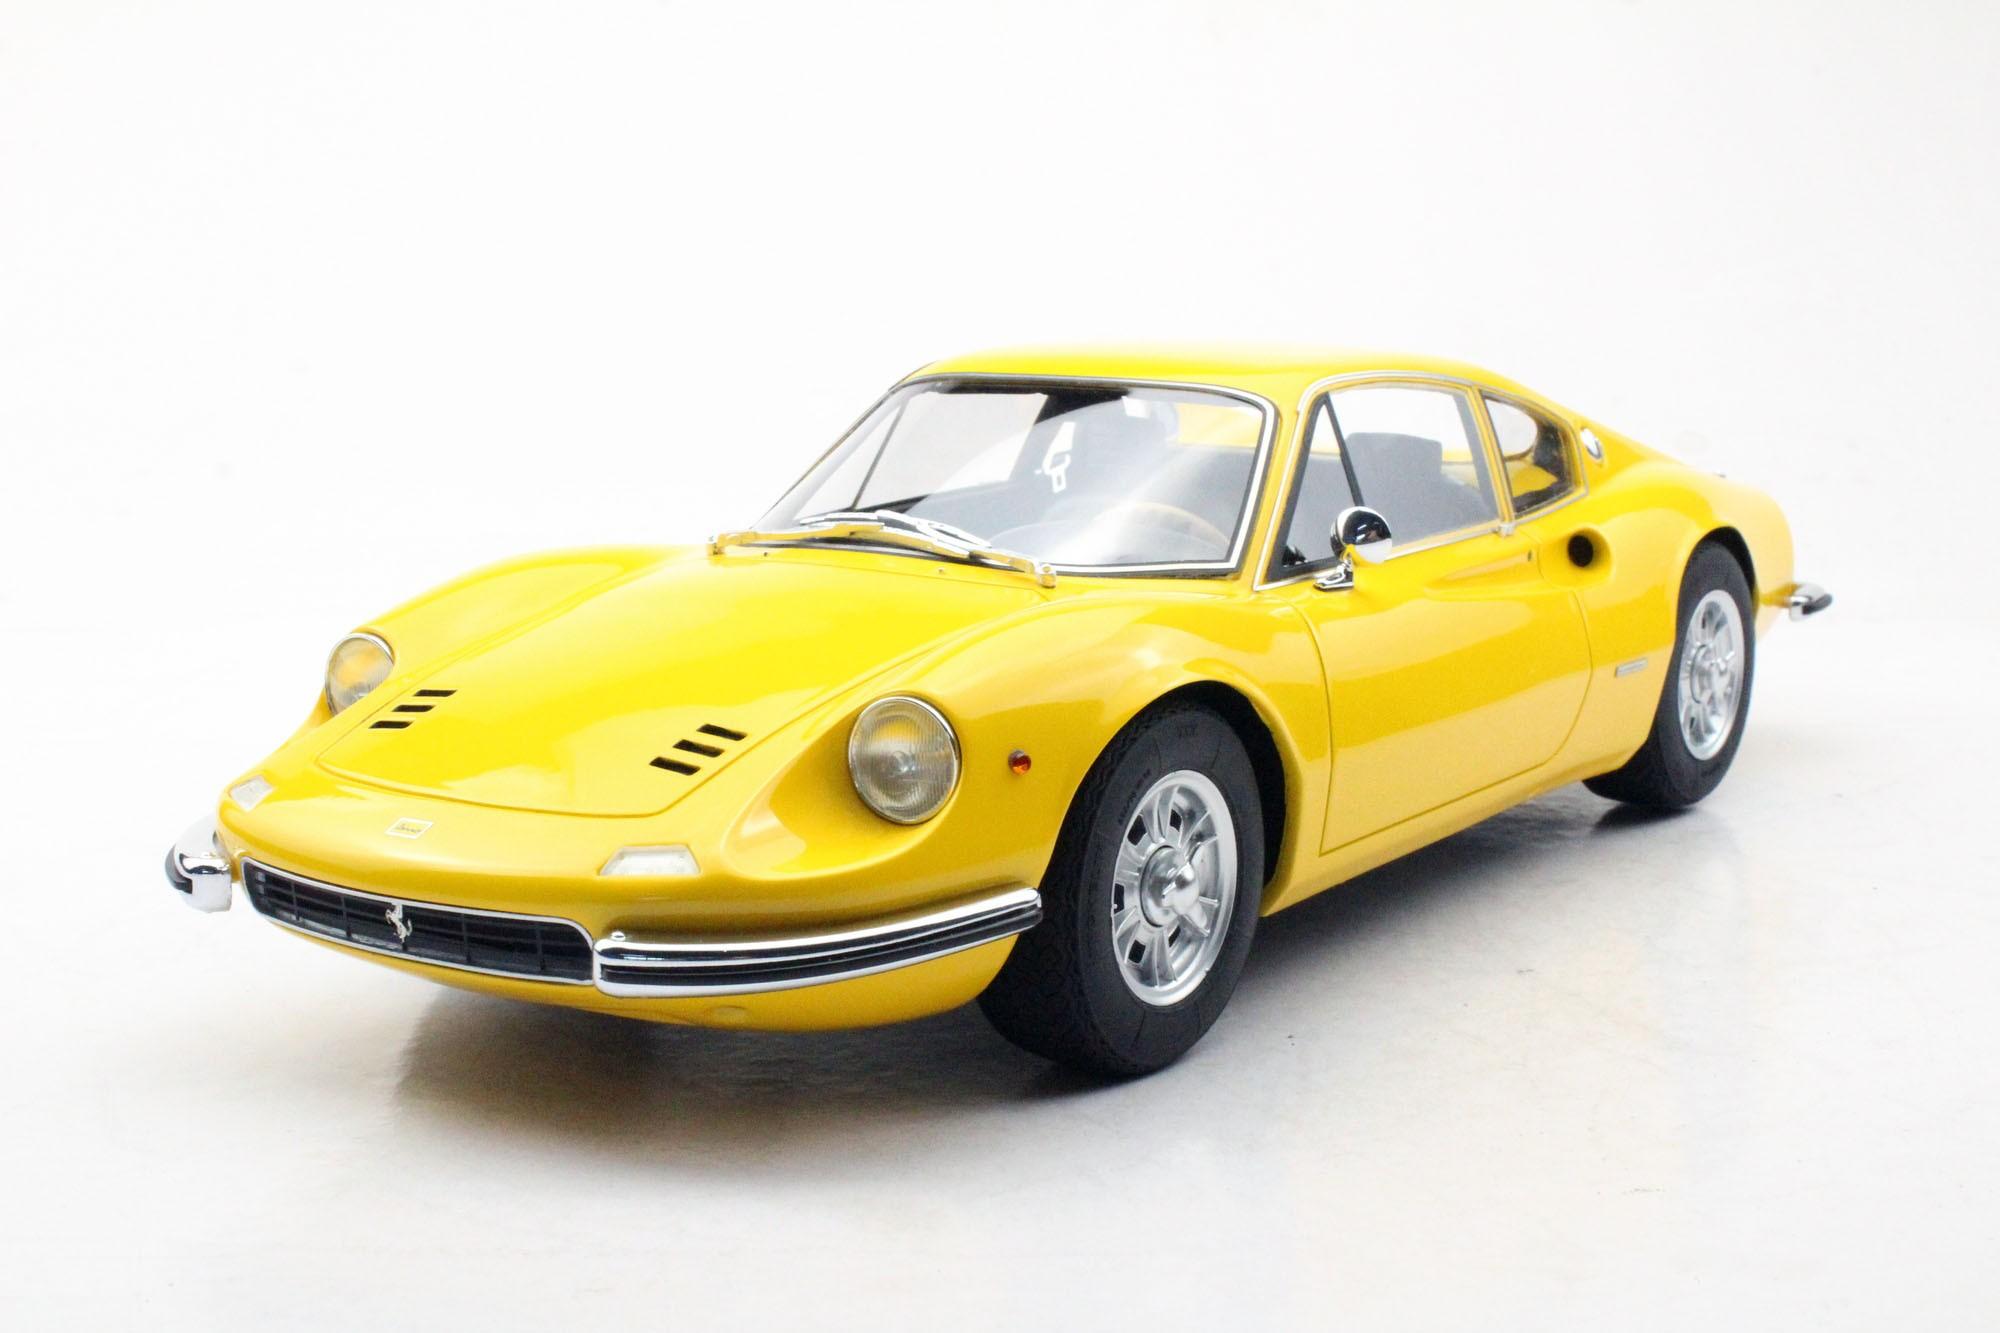 Top Marques Collectibles Ferrari Dino 206 Gt Pre Order 1 12 Yellow Tm12 23b